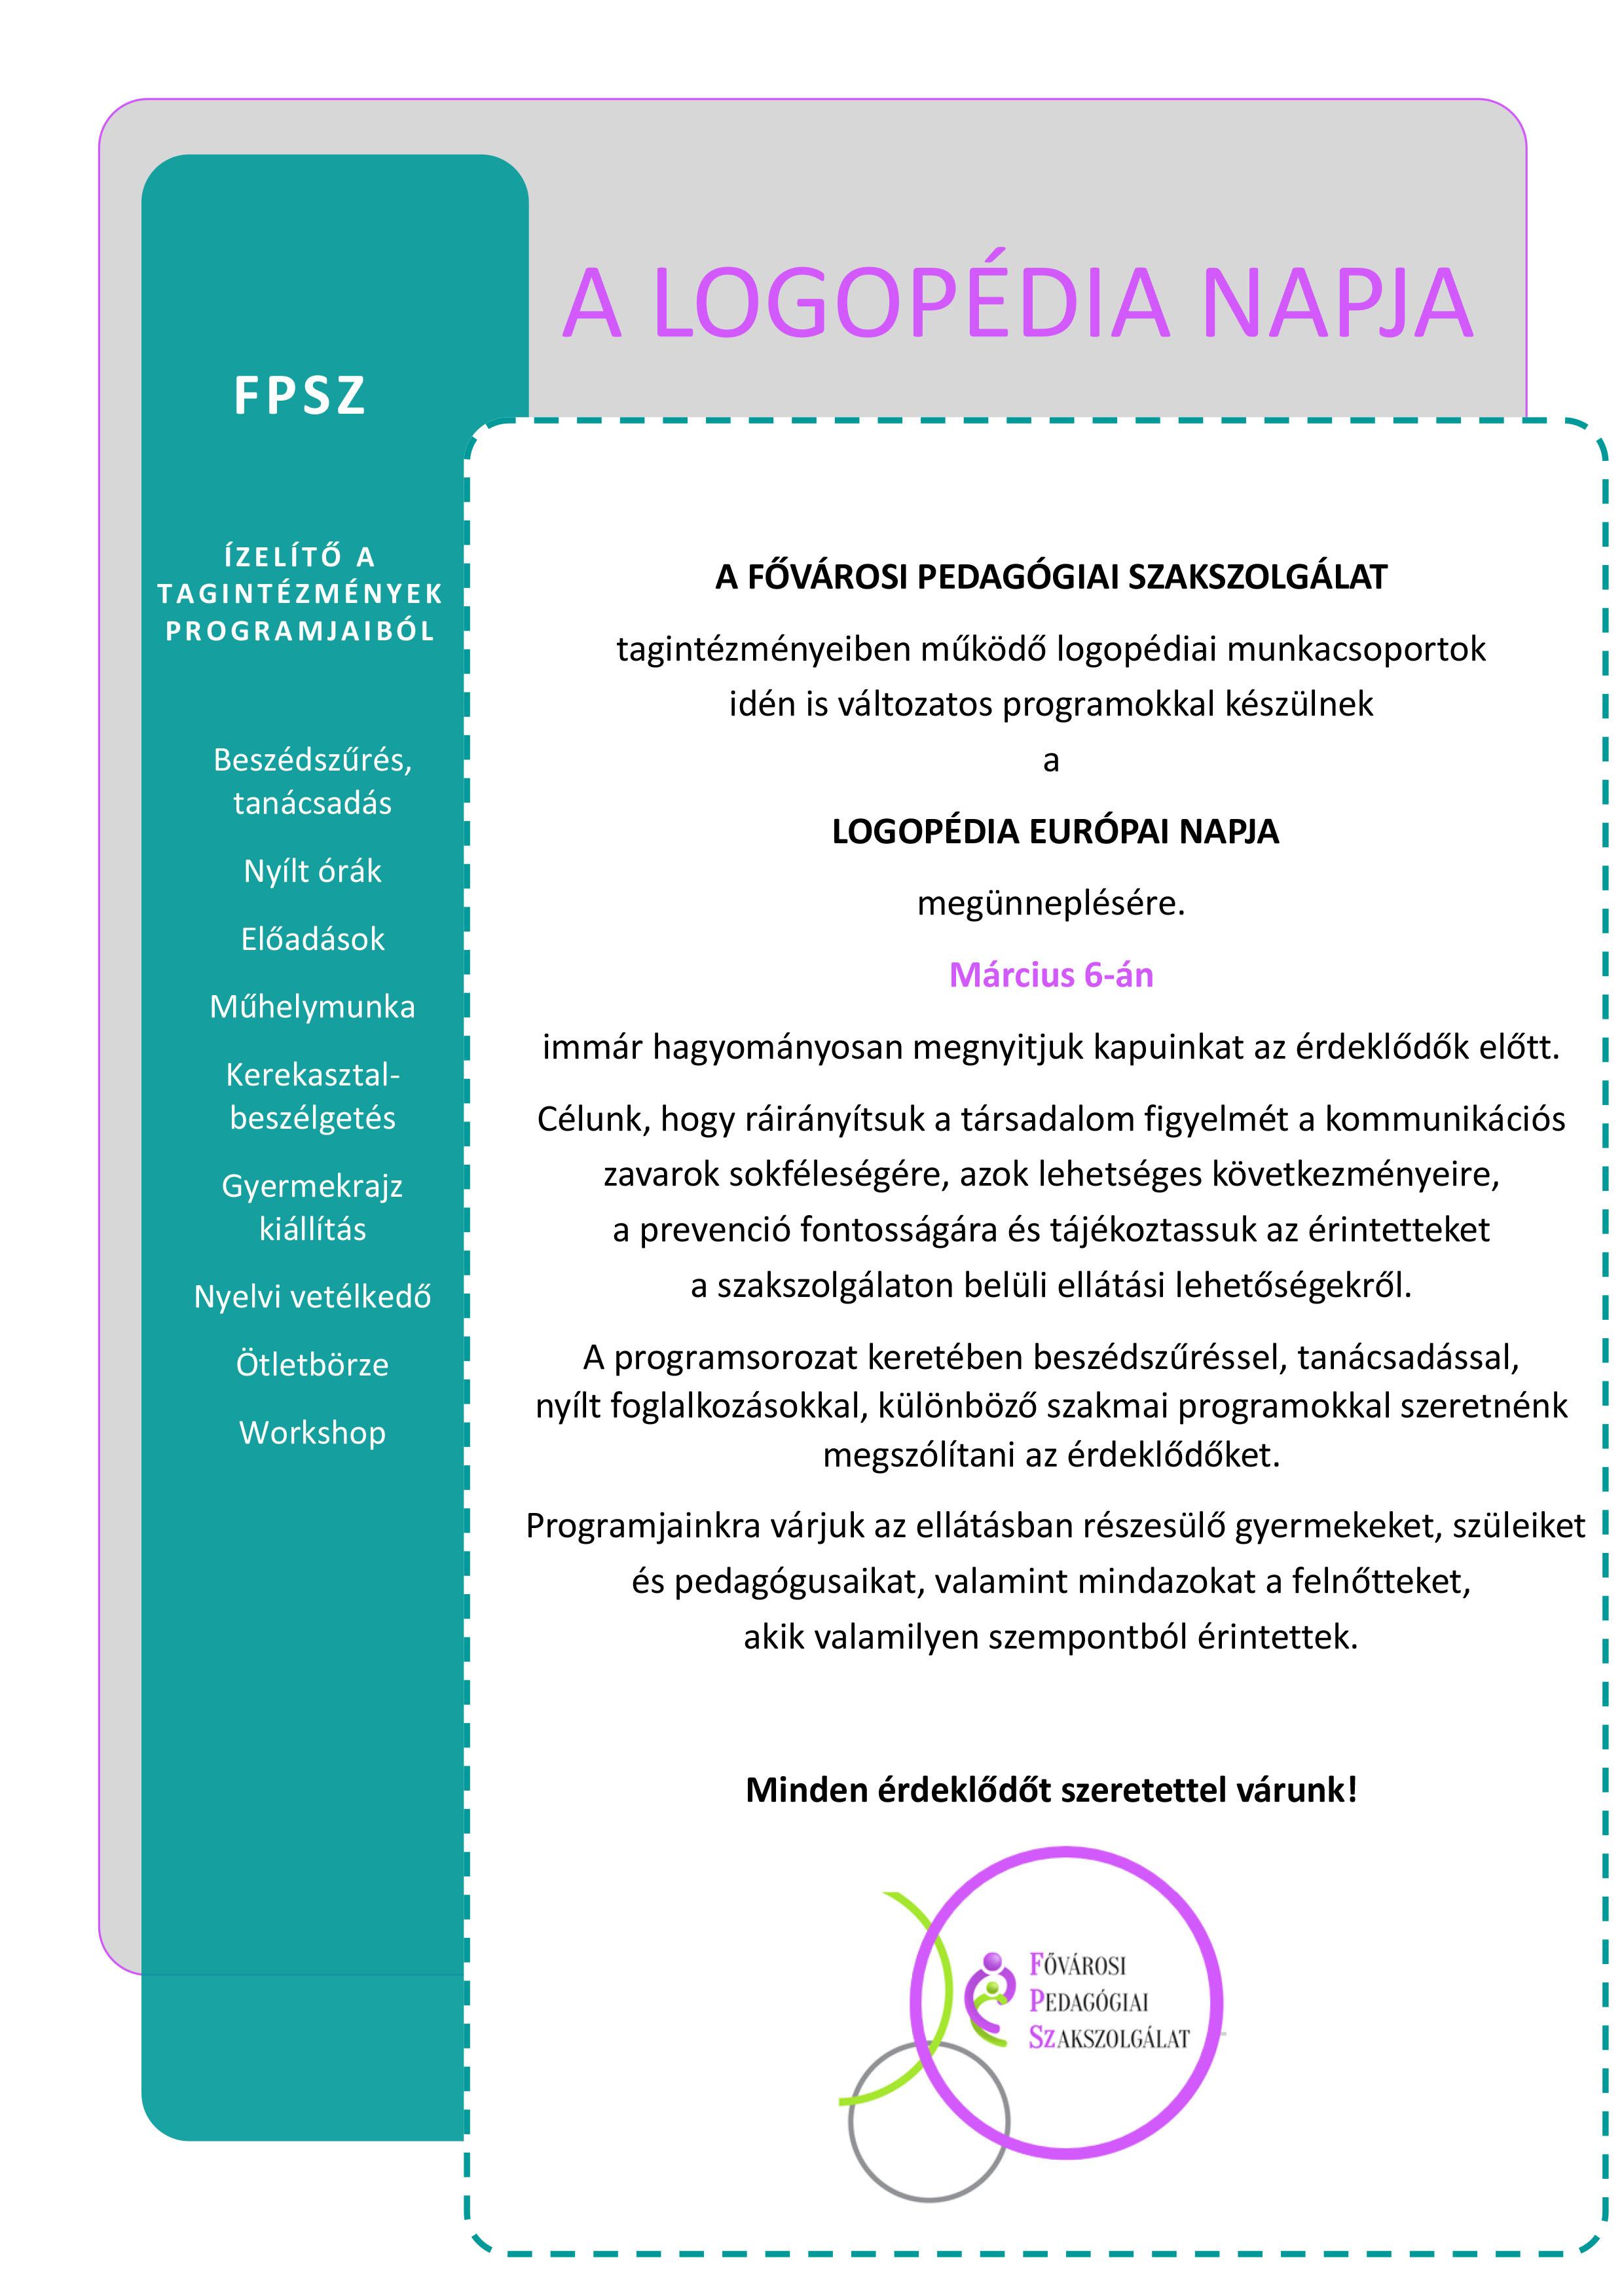 LogopediaEuropaiNapja2017_FPSZ-1